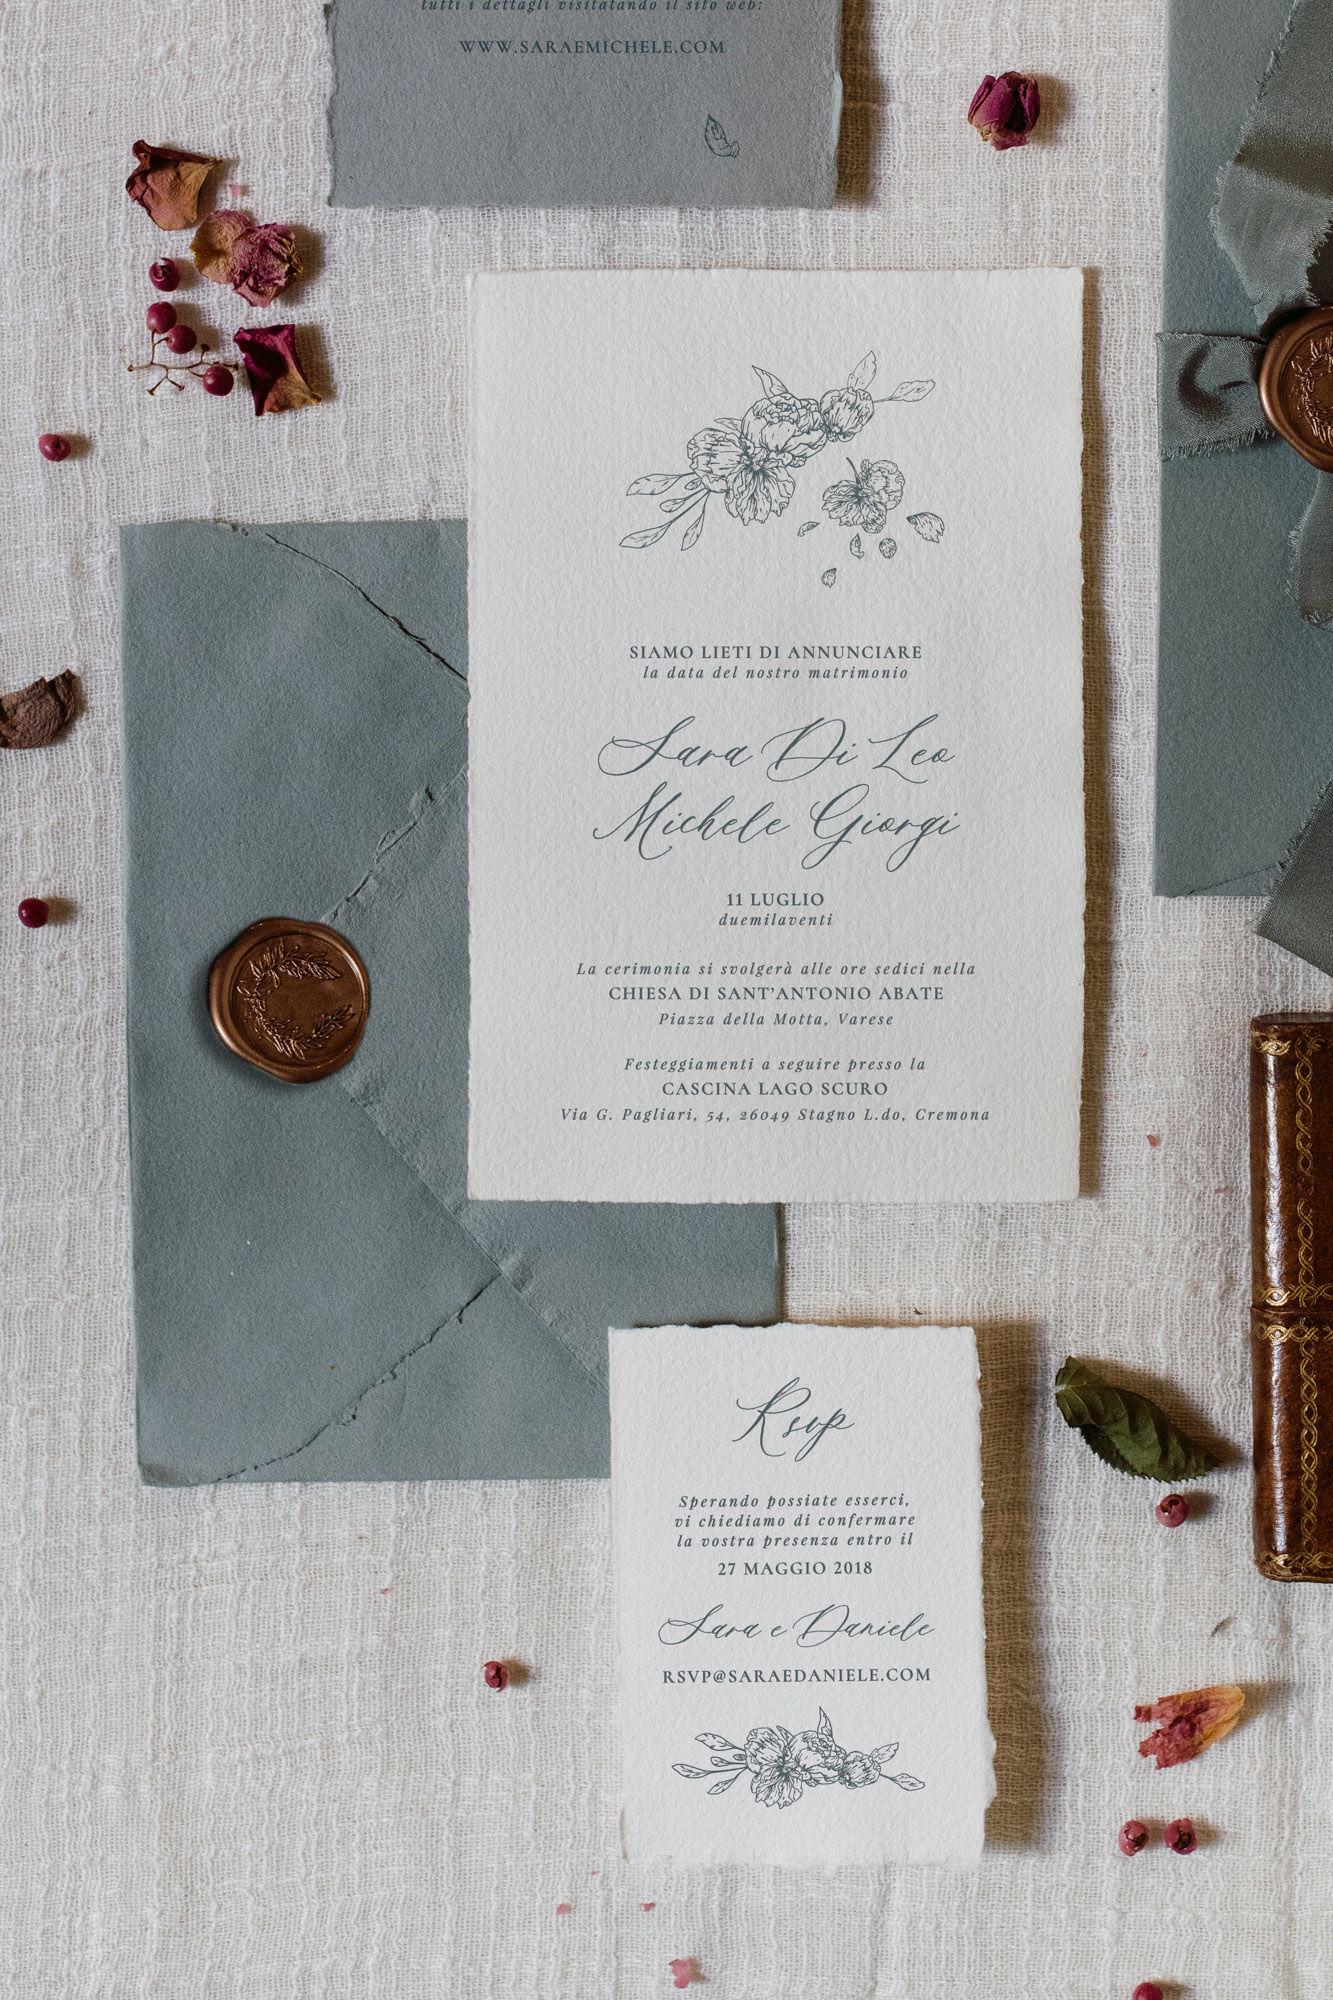 Partecipazioni Matrimonio Artigianali.Partecipazioni Matrimonio Seta Buste Artigianali Fioreale Studio